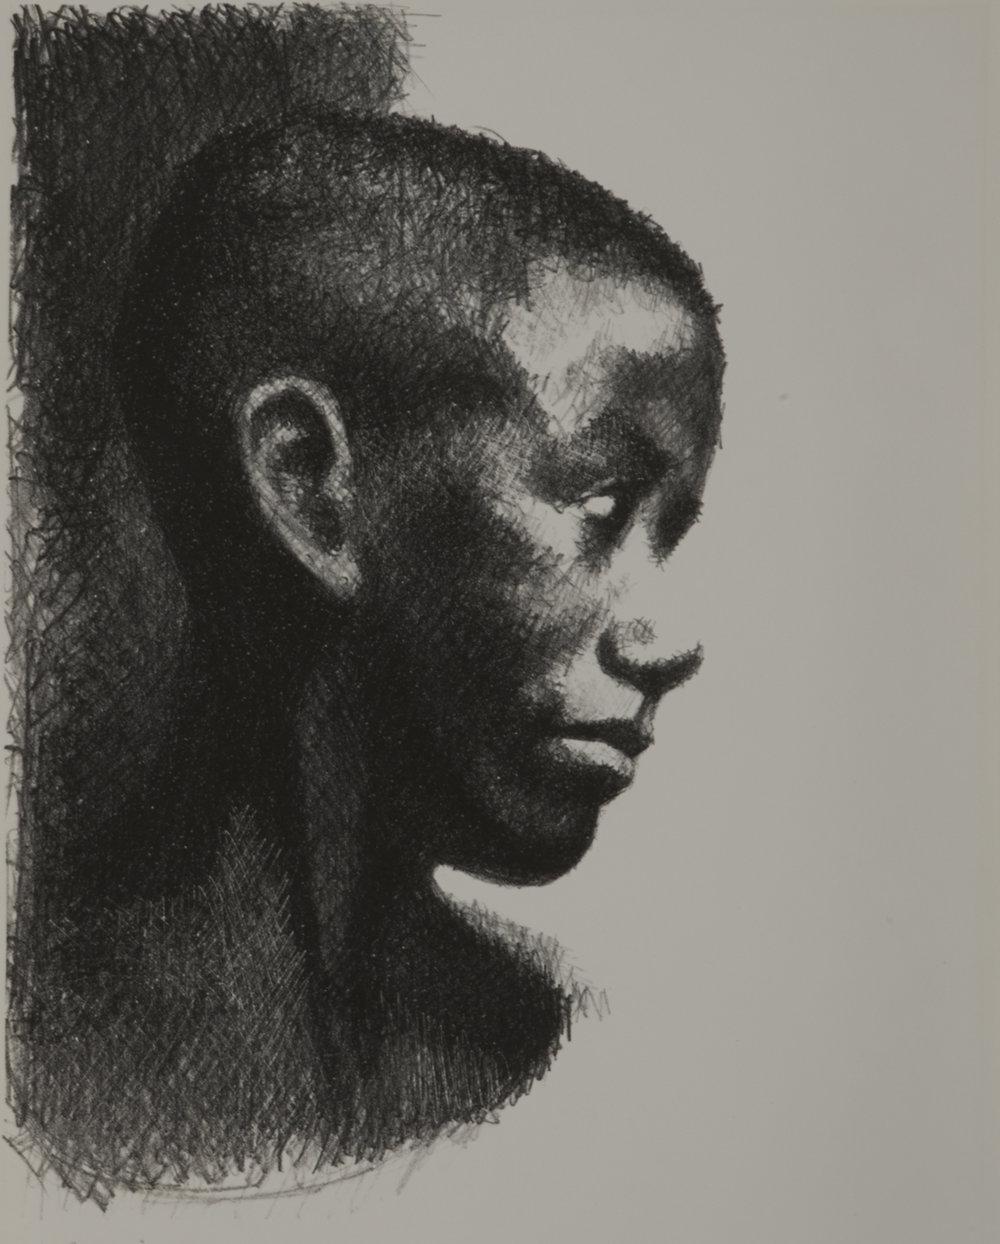 Ernest Crichlow (1914-2005)